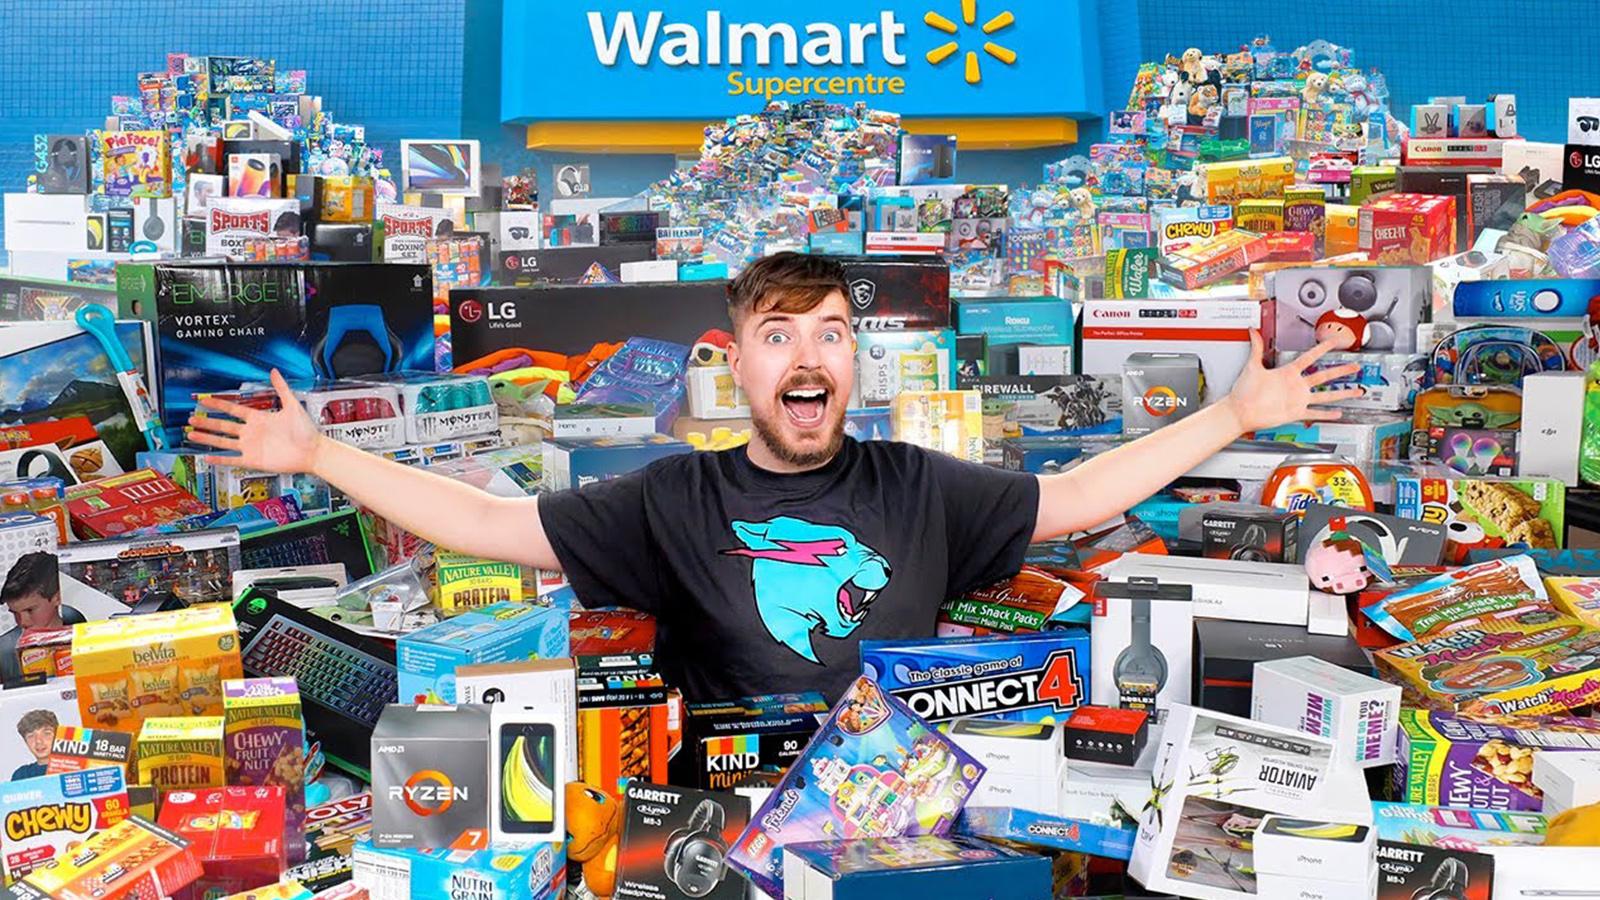 MrBeast Walmart